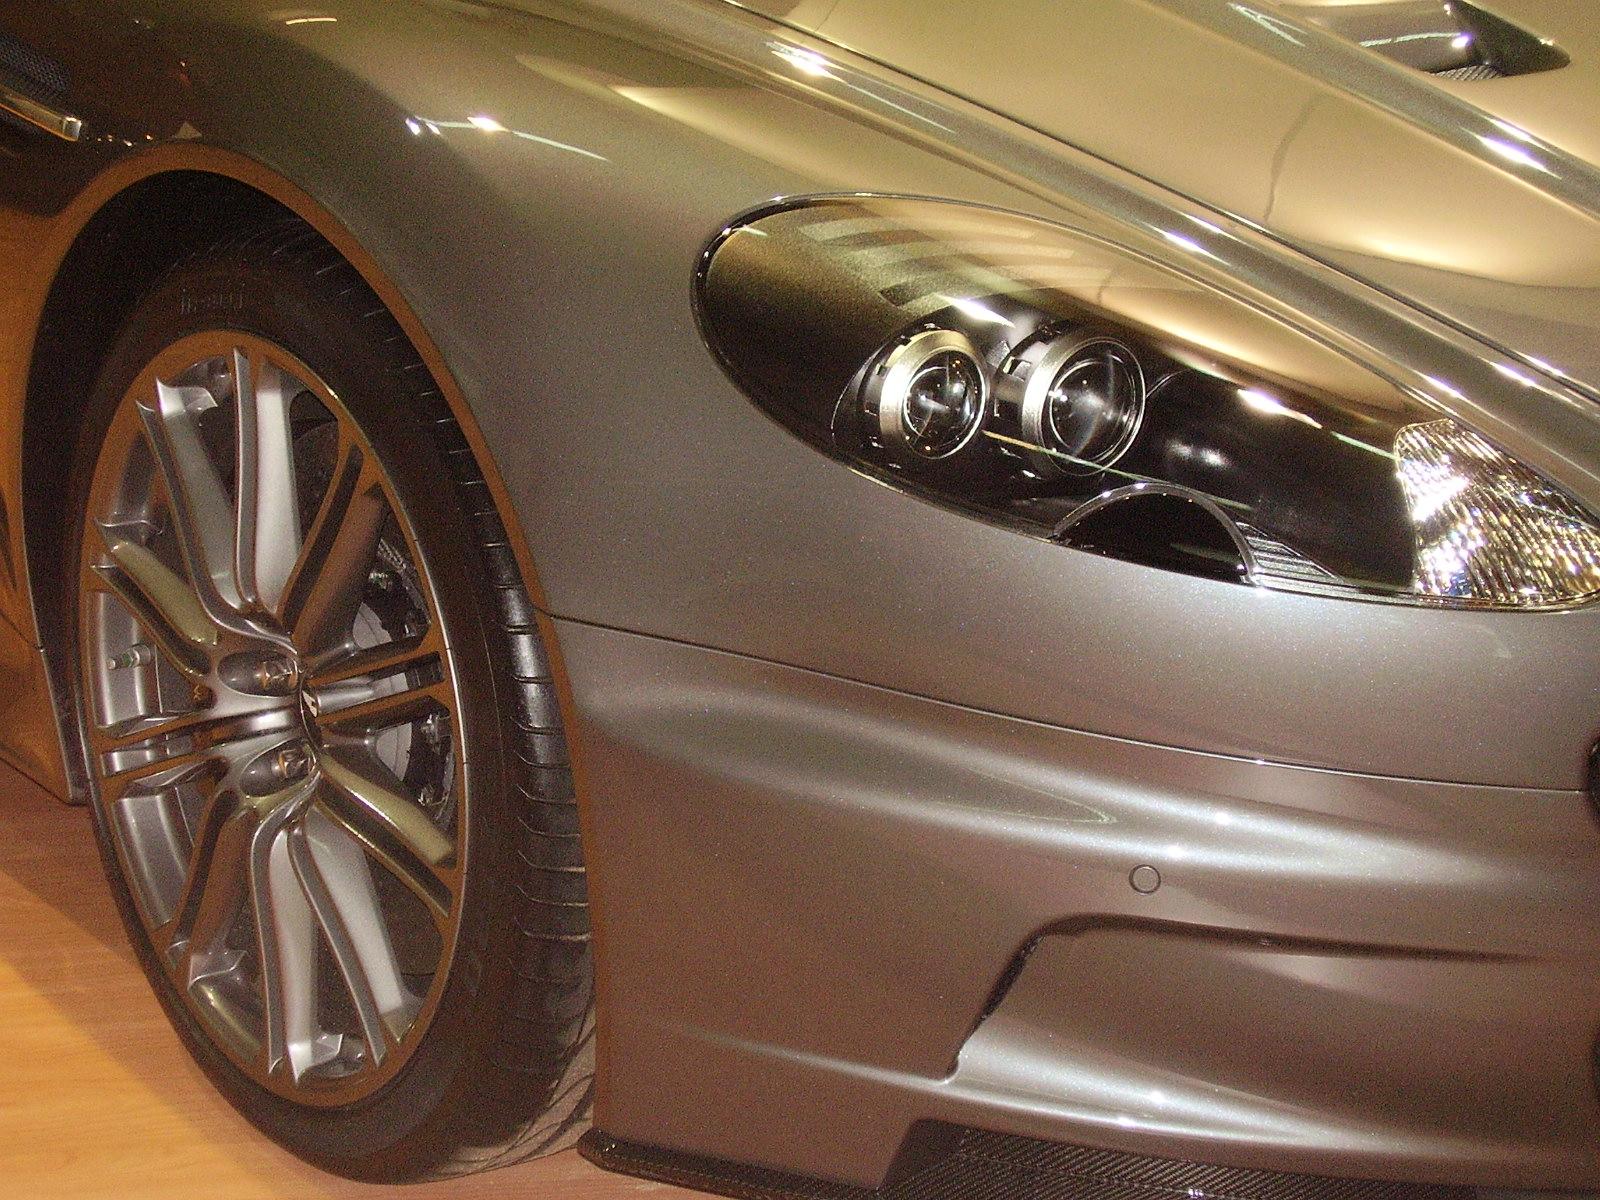 Visita Salon Automovil 09 BCN / Visit to Car Exhibition 09 Barcelona-P5140771.JPG